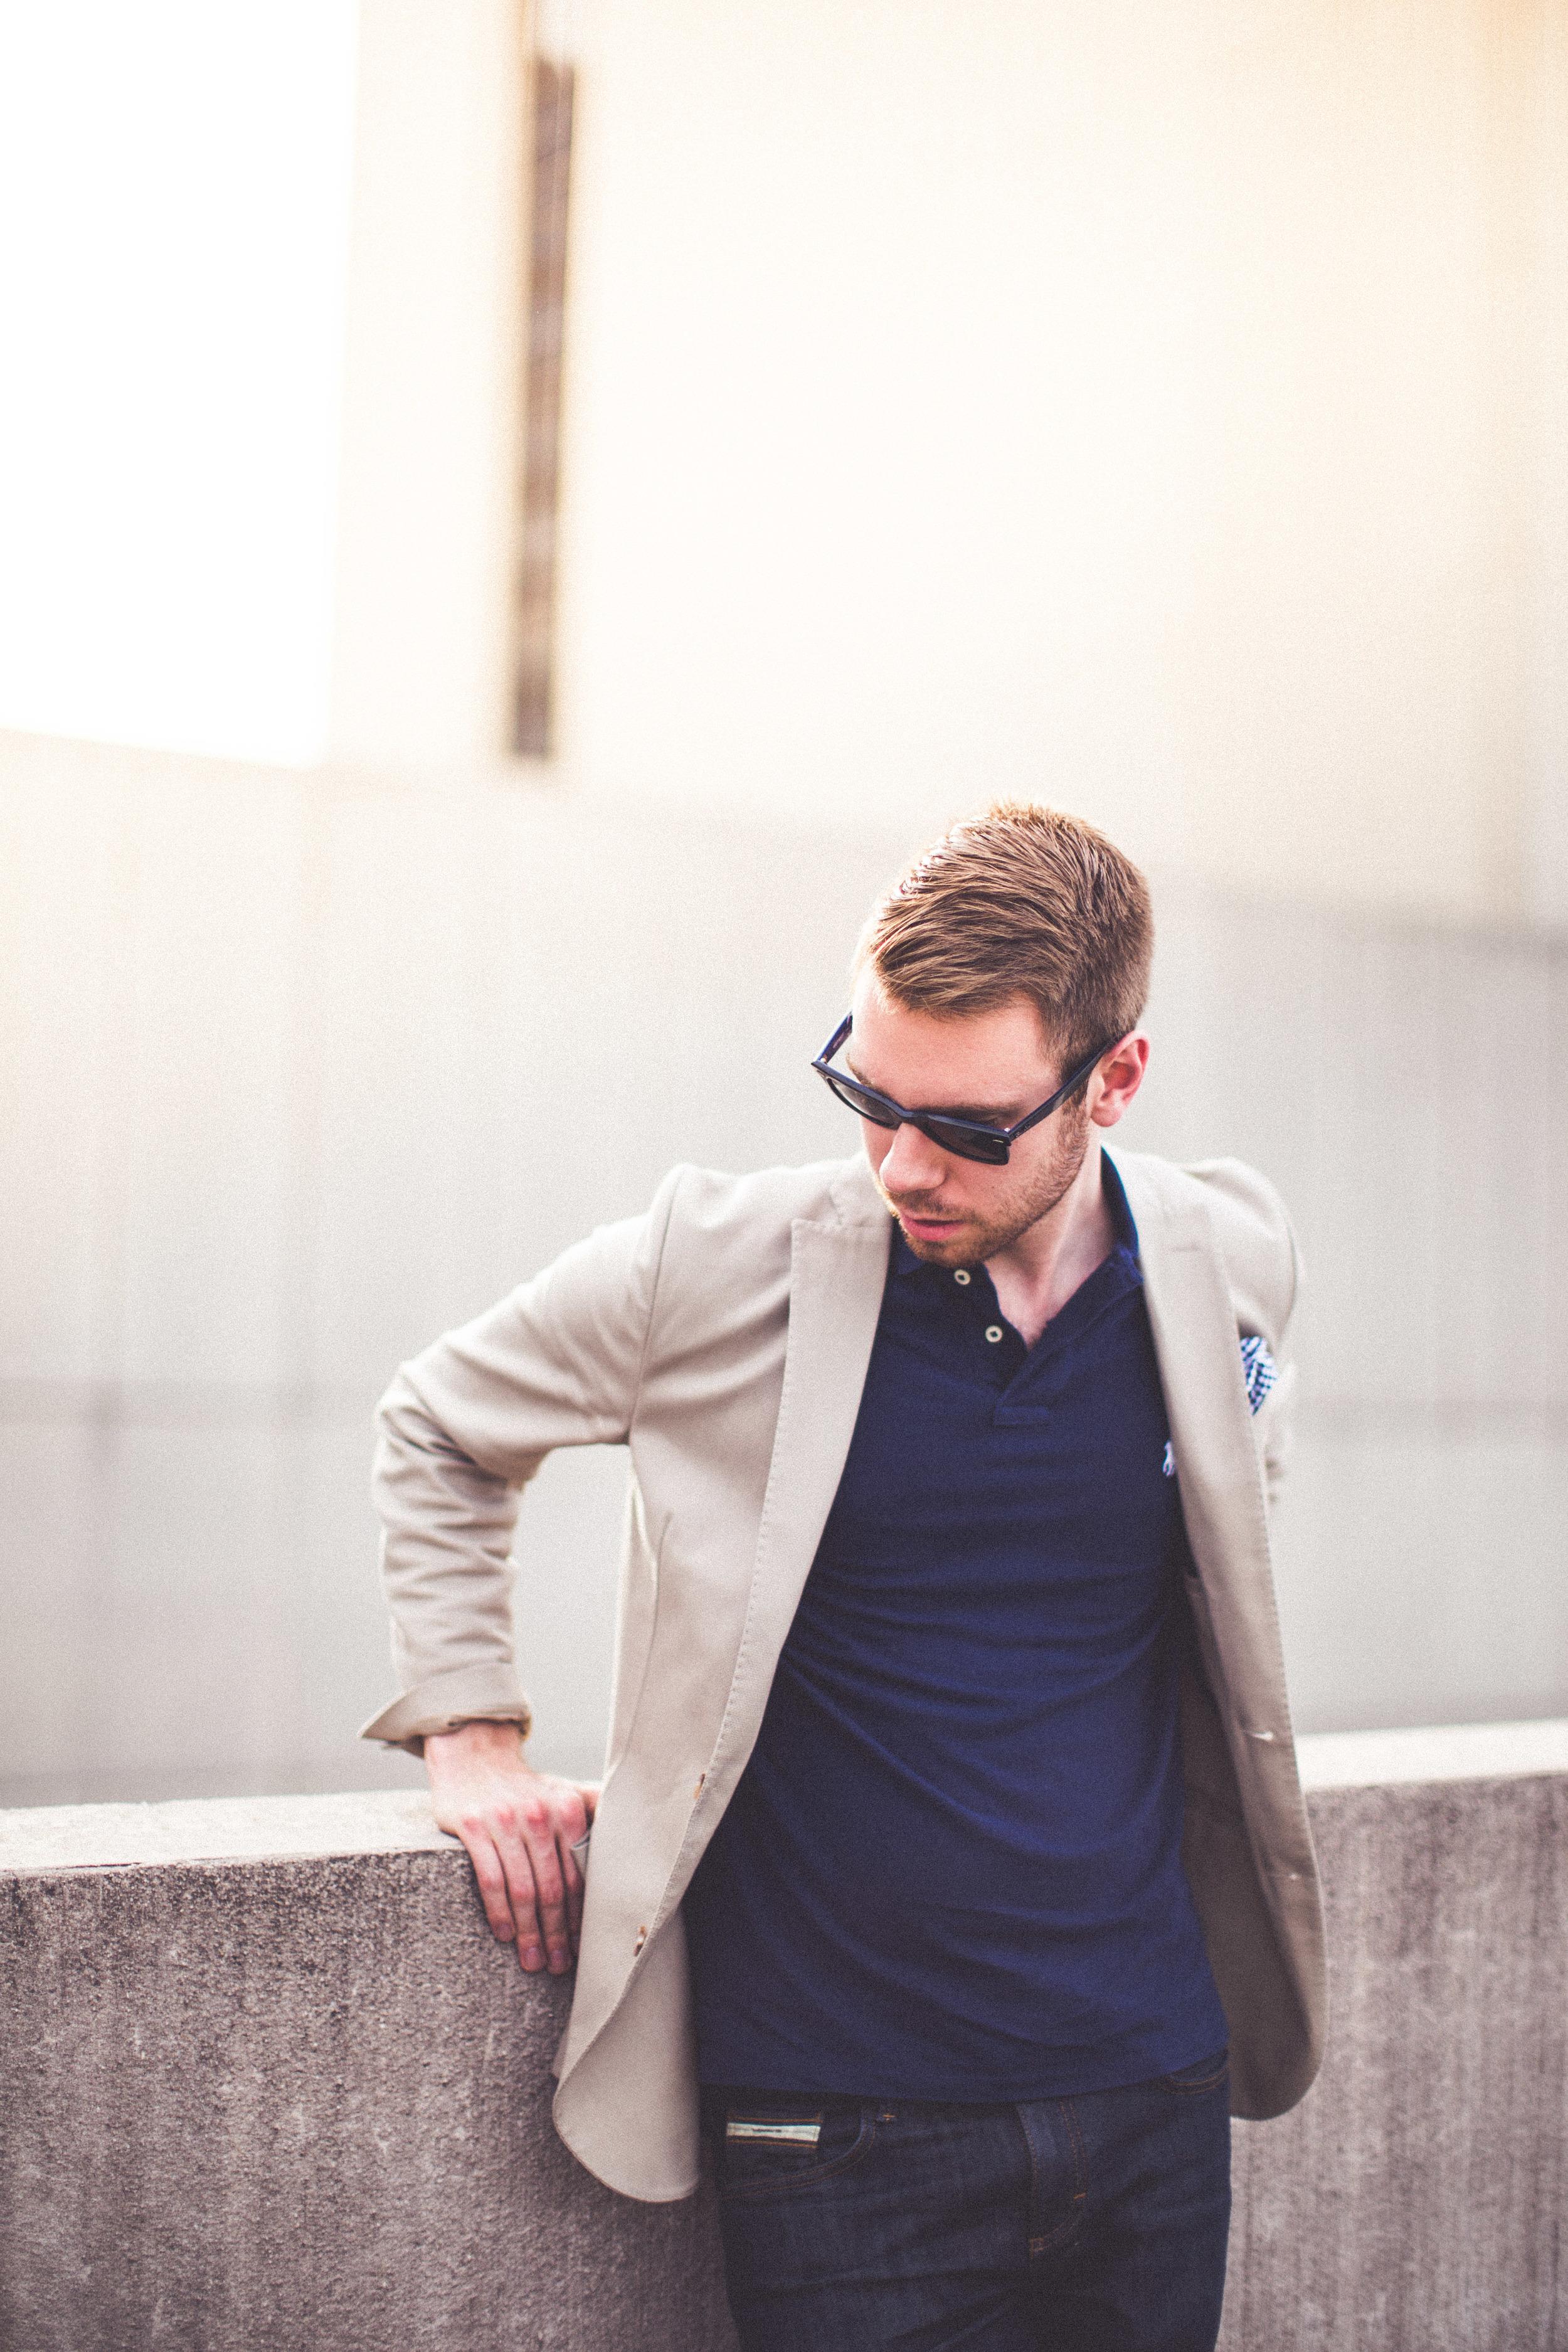 Shirt: Ralph Lauren, Blazer: J. Jindeberg, Pocket Square: J Crew, Sunglasses: Ray-Ban, Watch: Daniel Wellington, Jeans: Vans